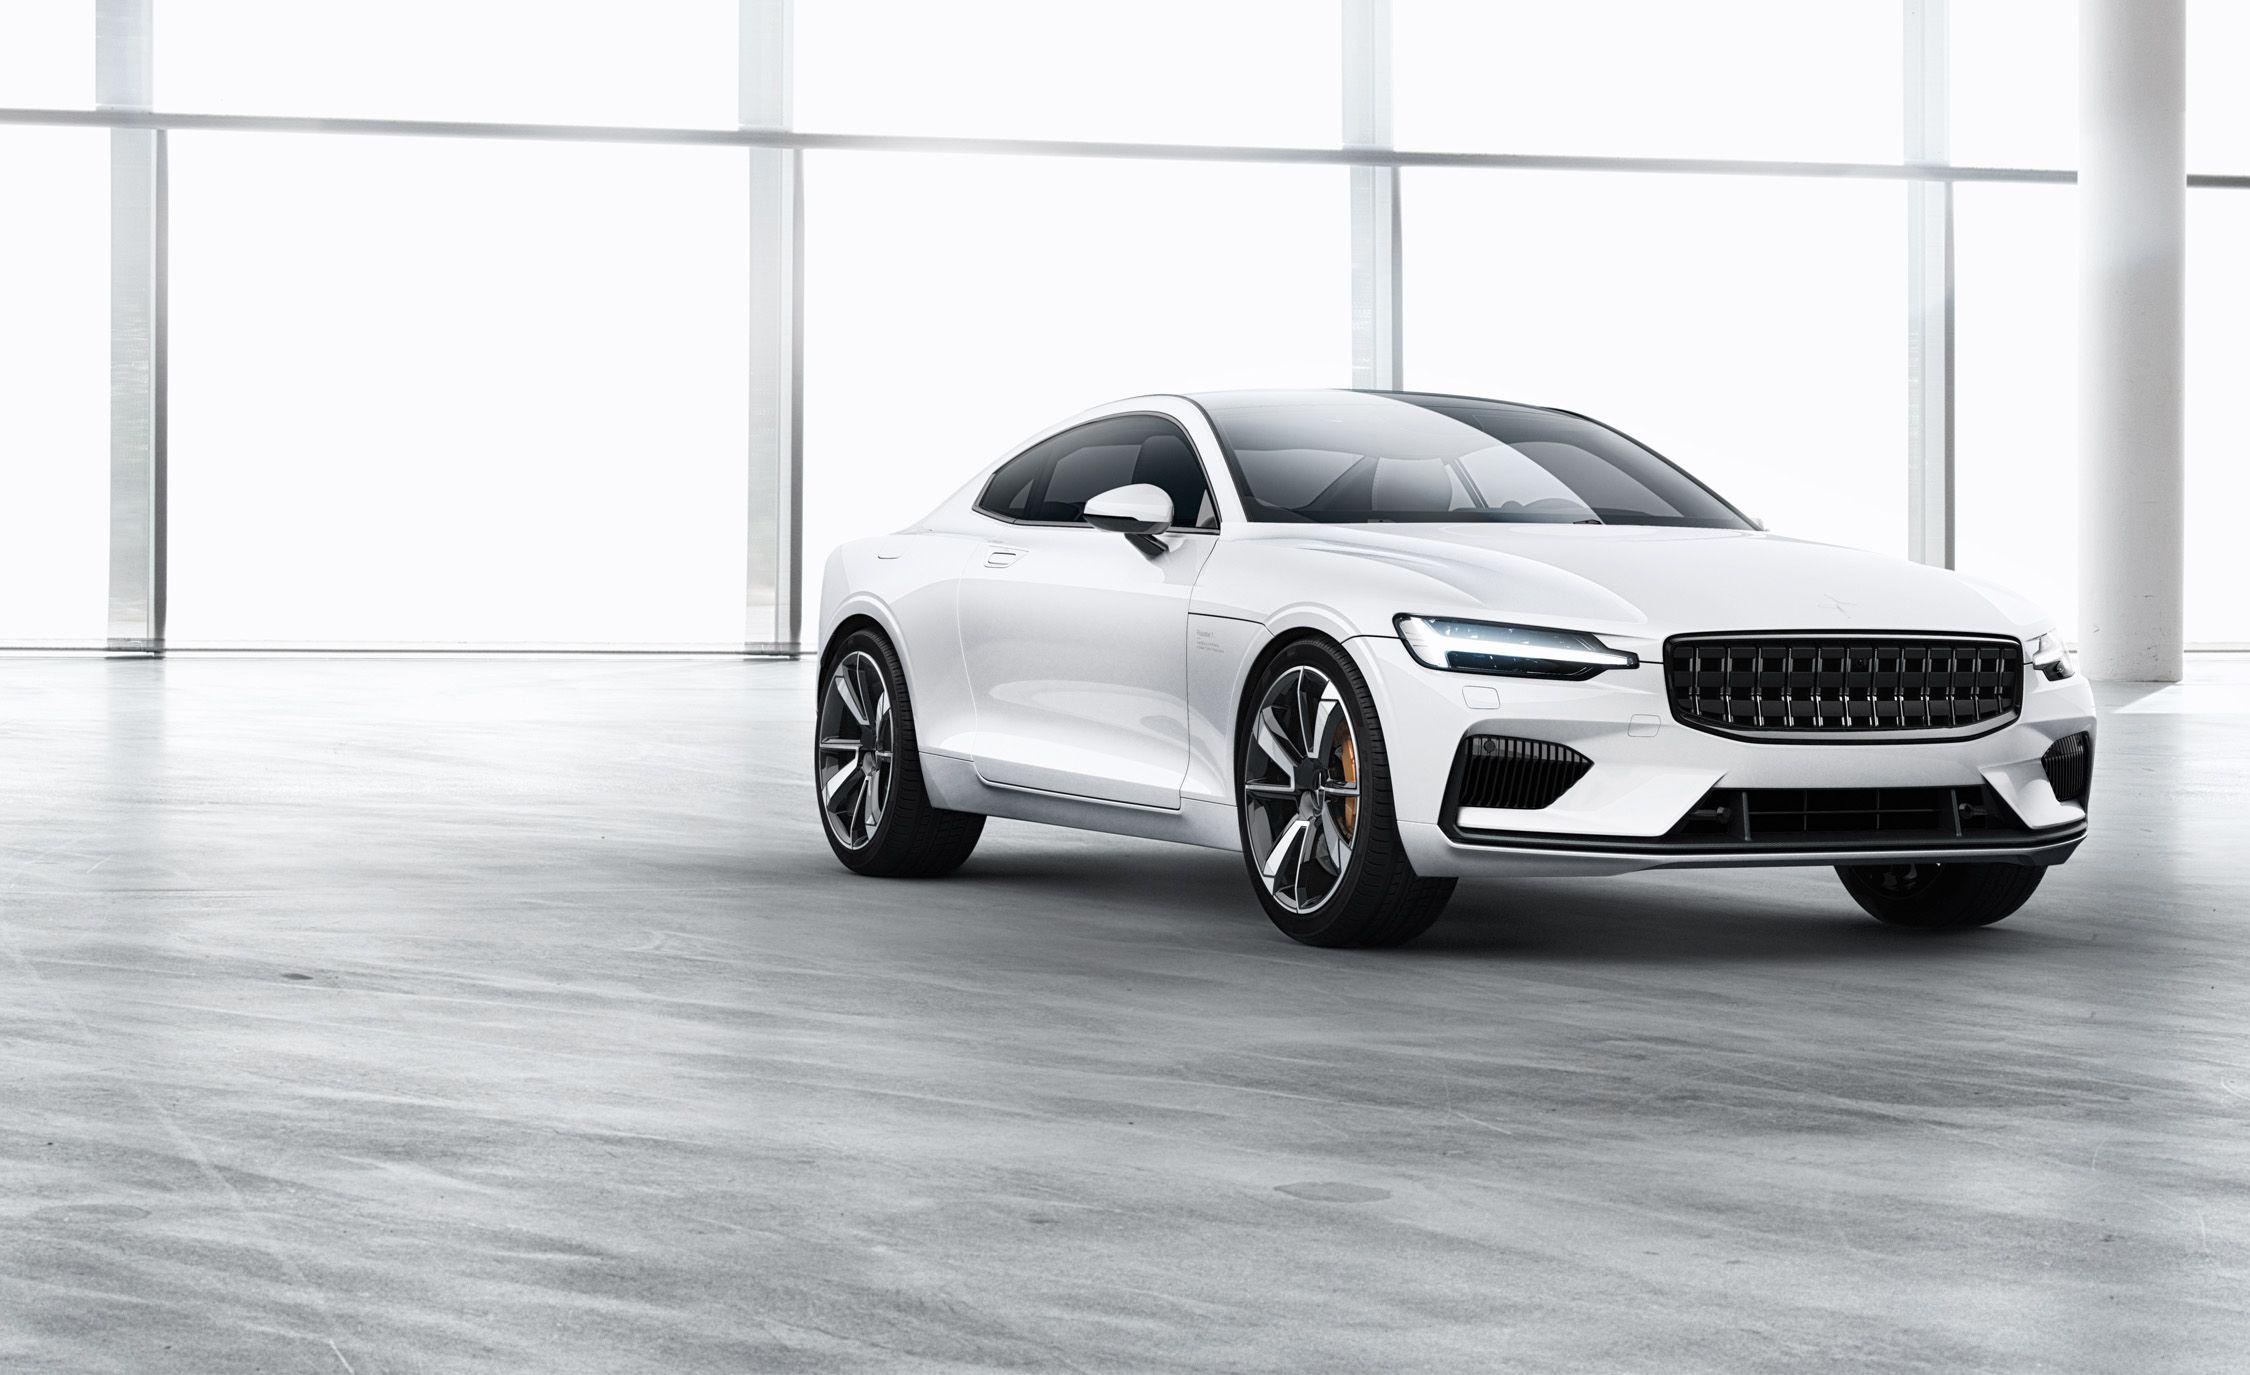 2020 Polestar 1: The S90 Coupe Volvo Won't Build